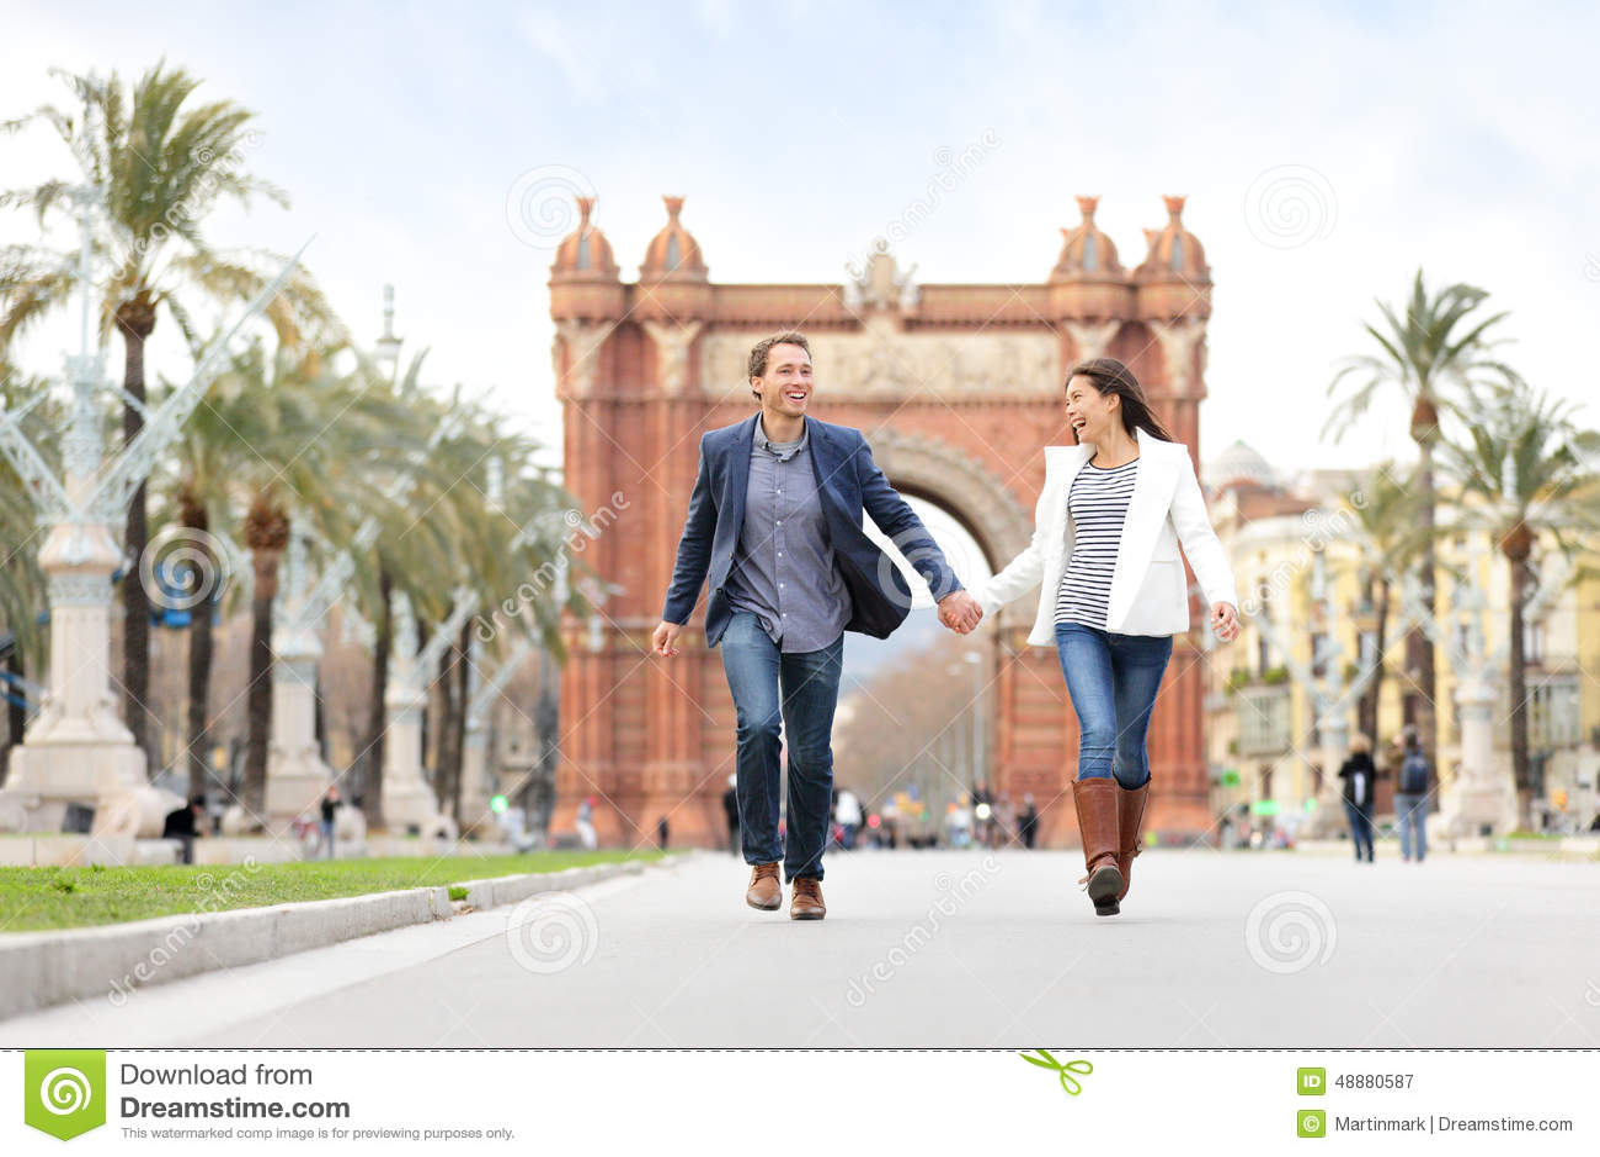 barcelona spain dating